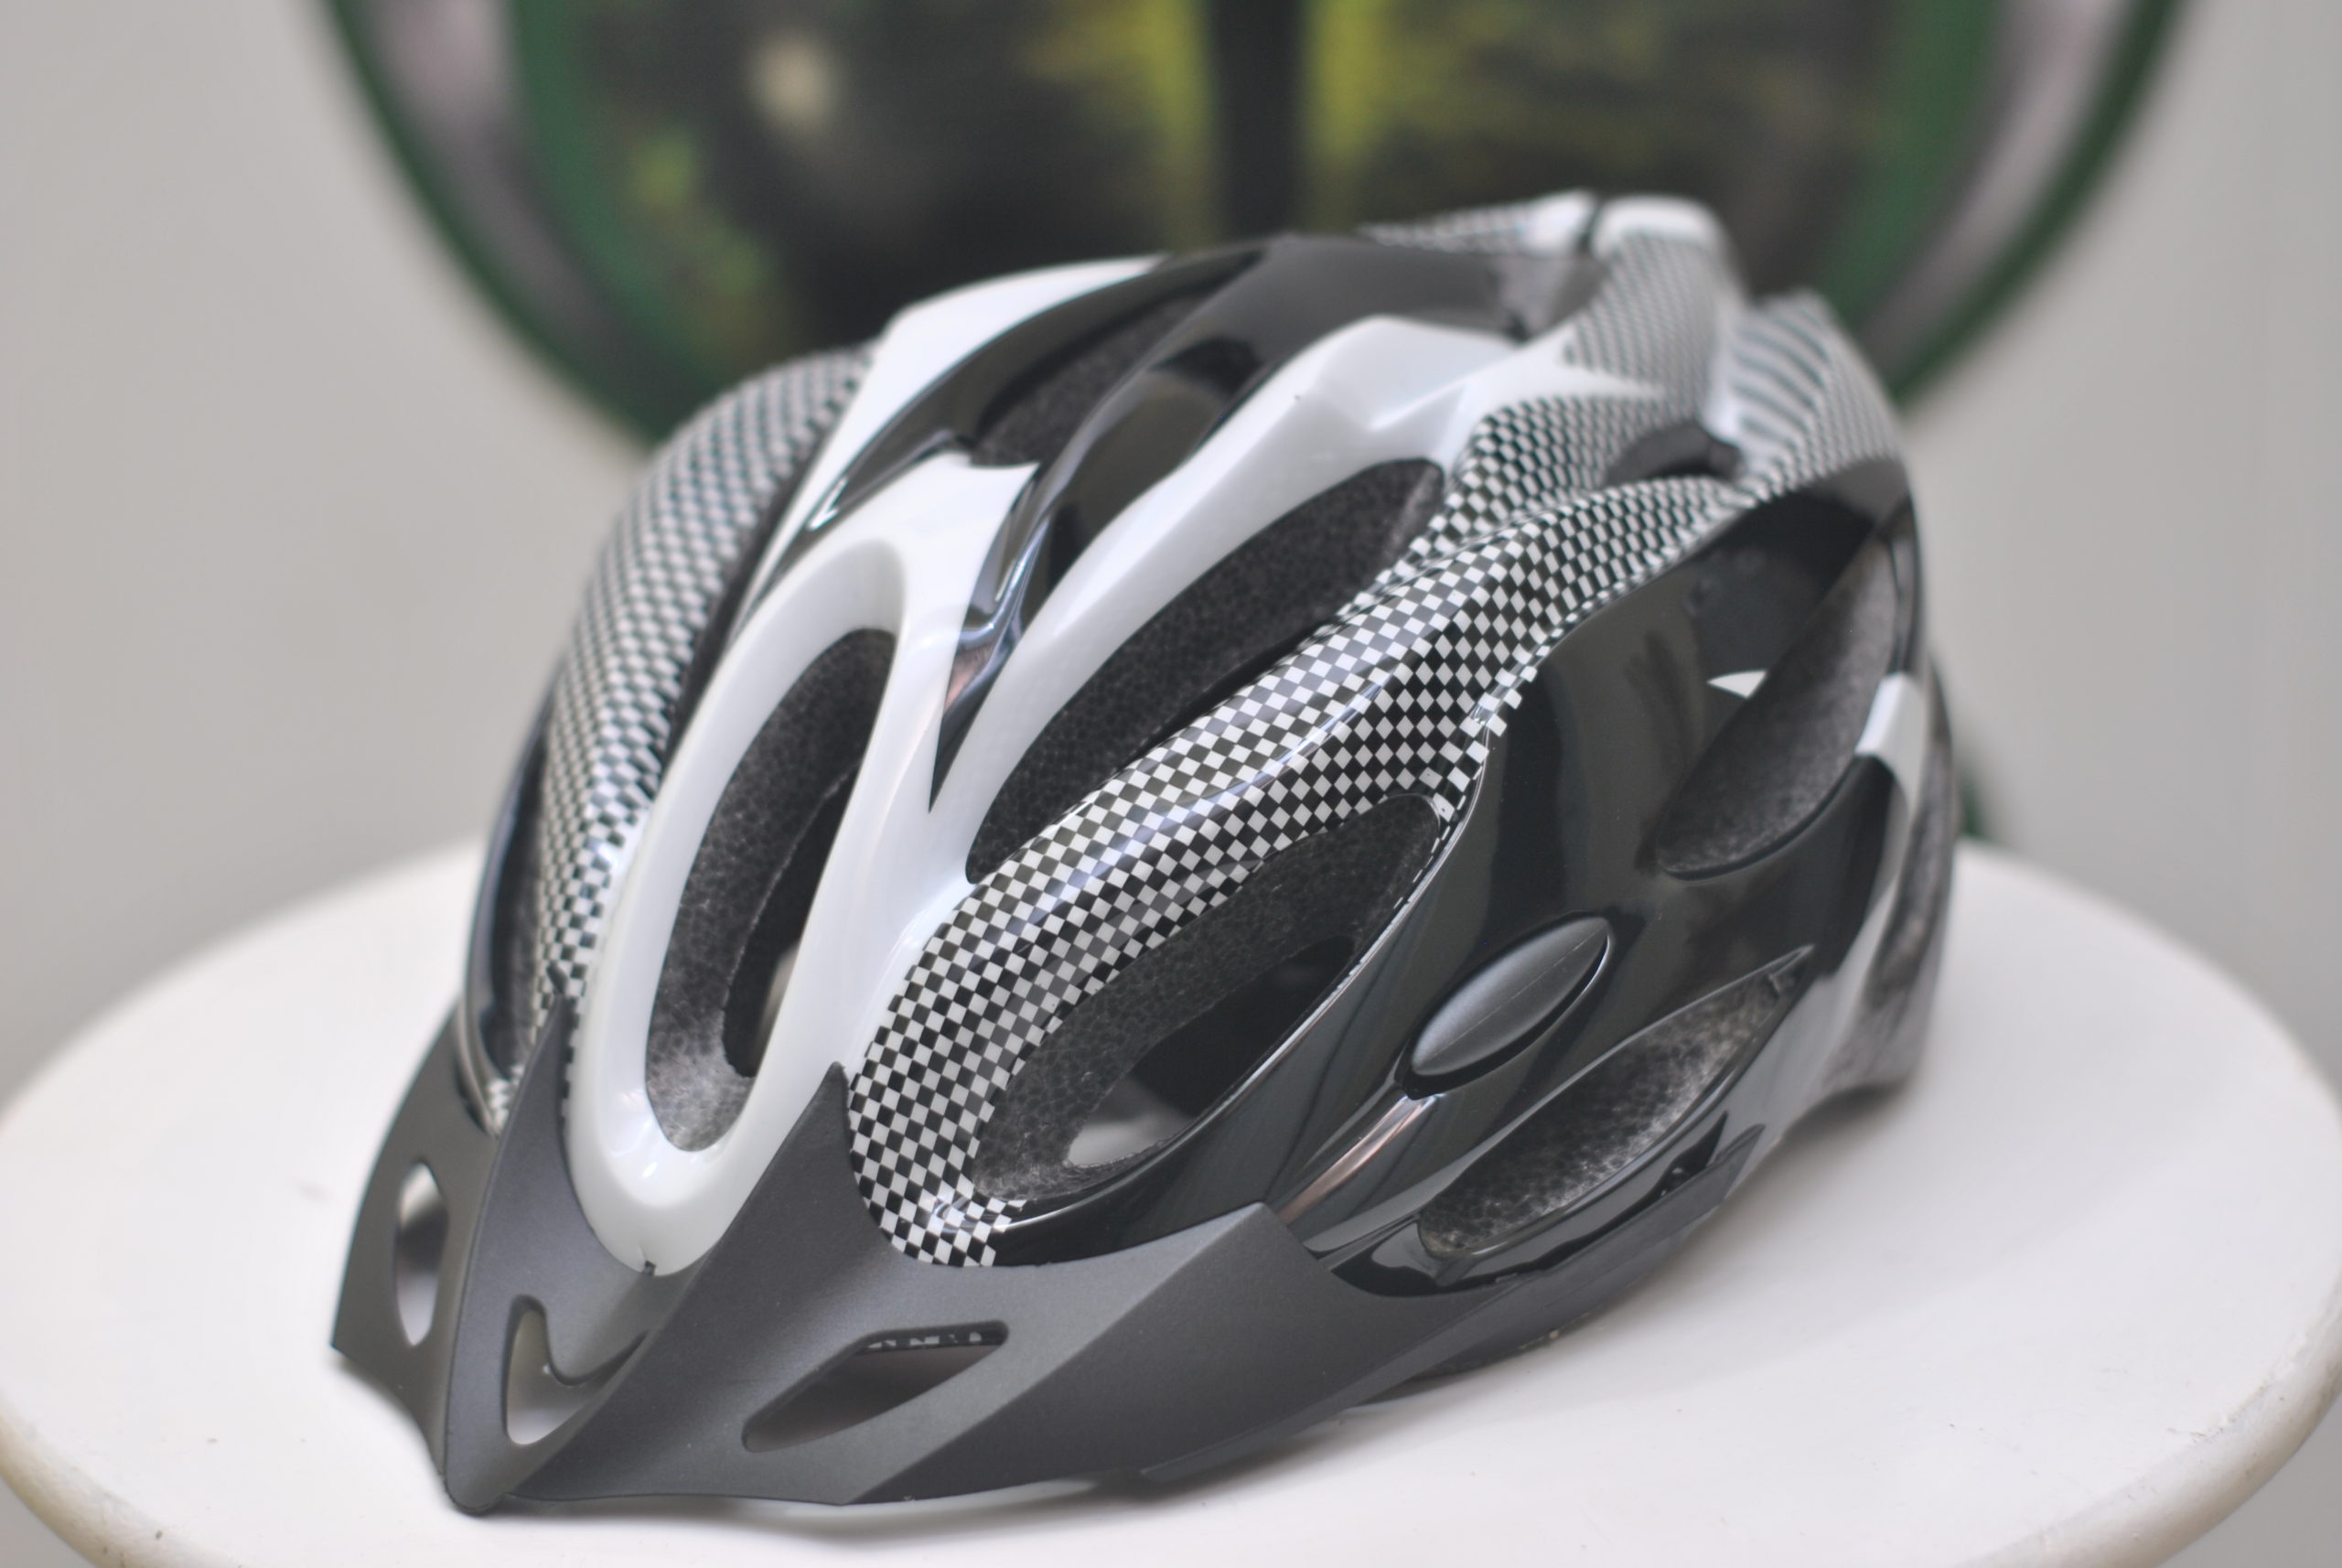 casco_protector_bicicletas_croco_online_store